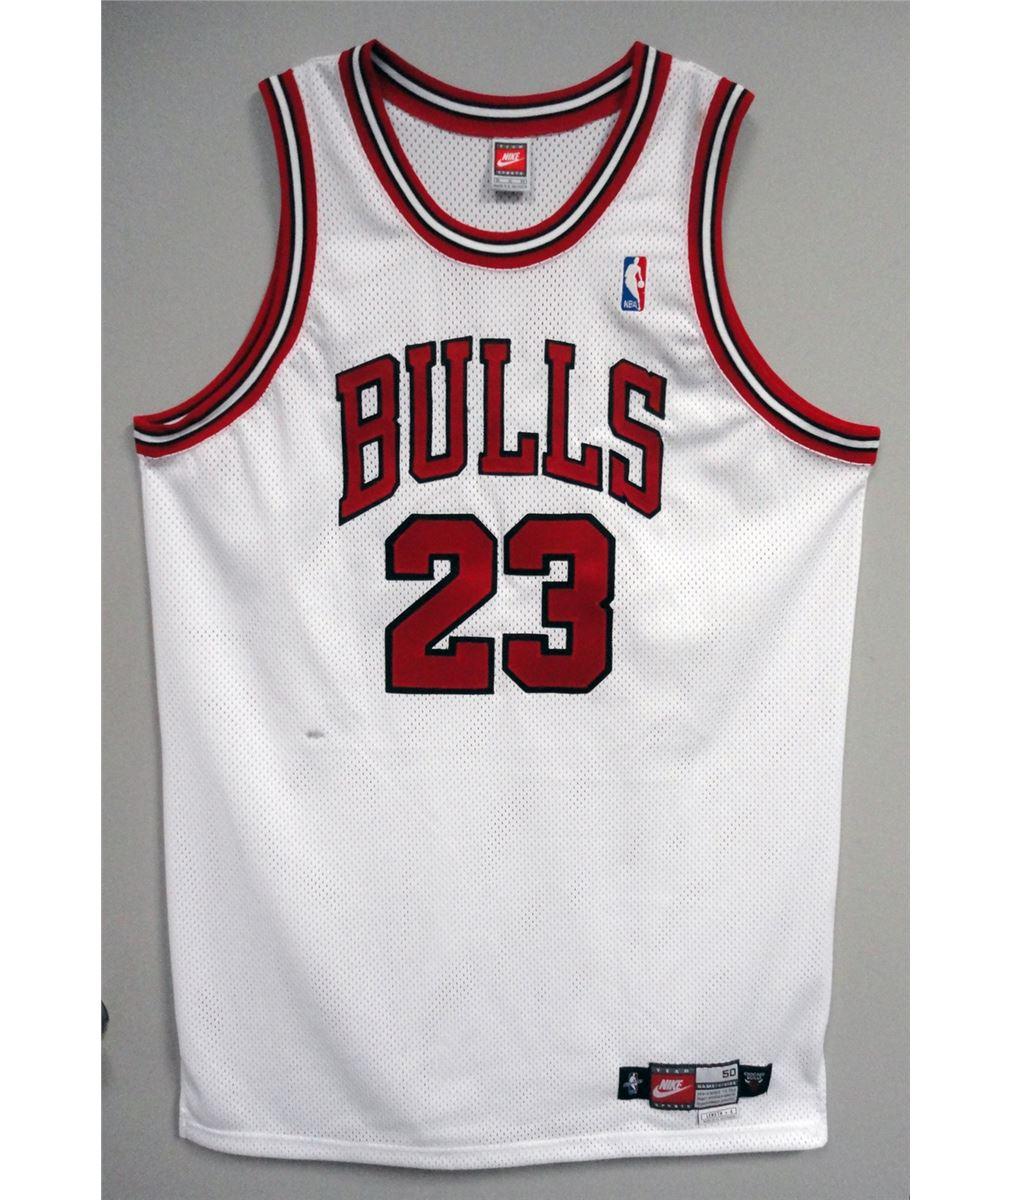 buy popular 05ddb cbf30 Michael Jordan Autographed White Bulls #23 Jersey